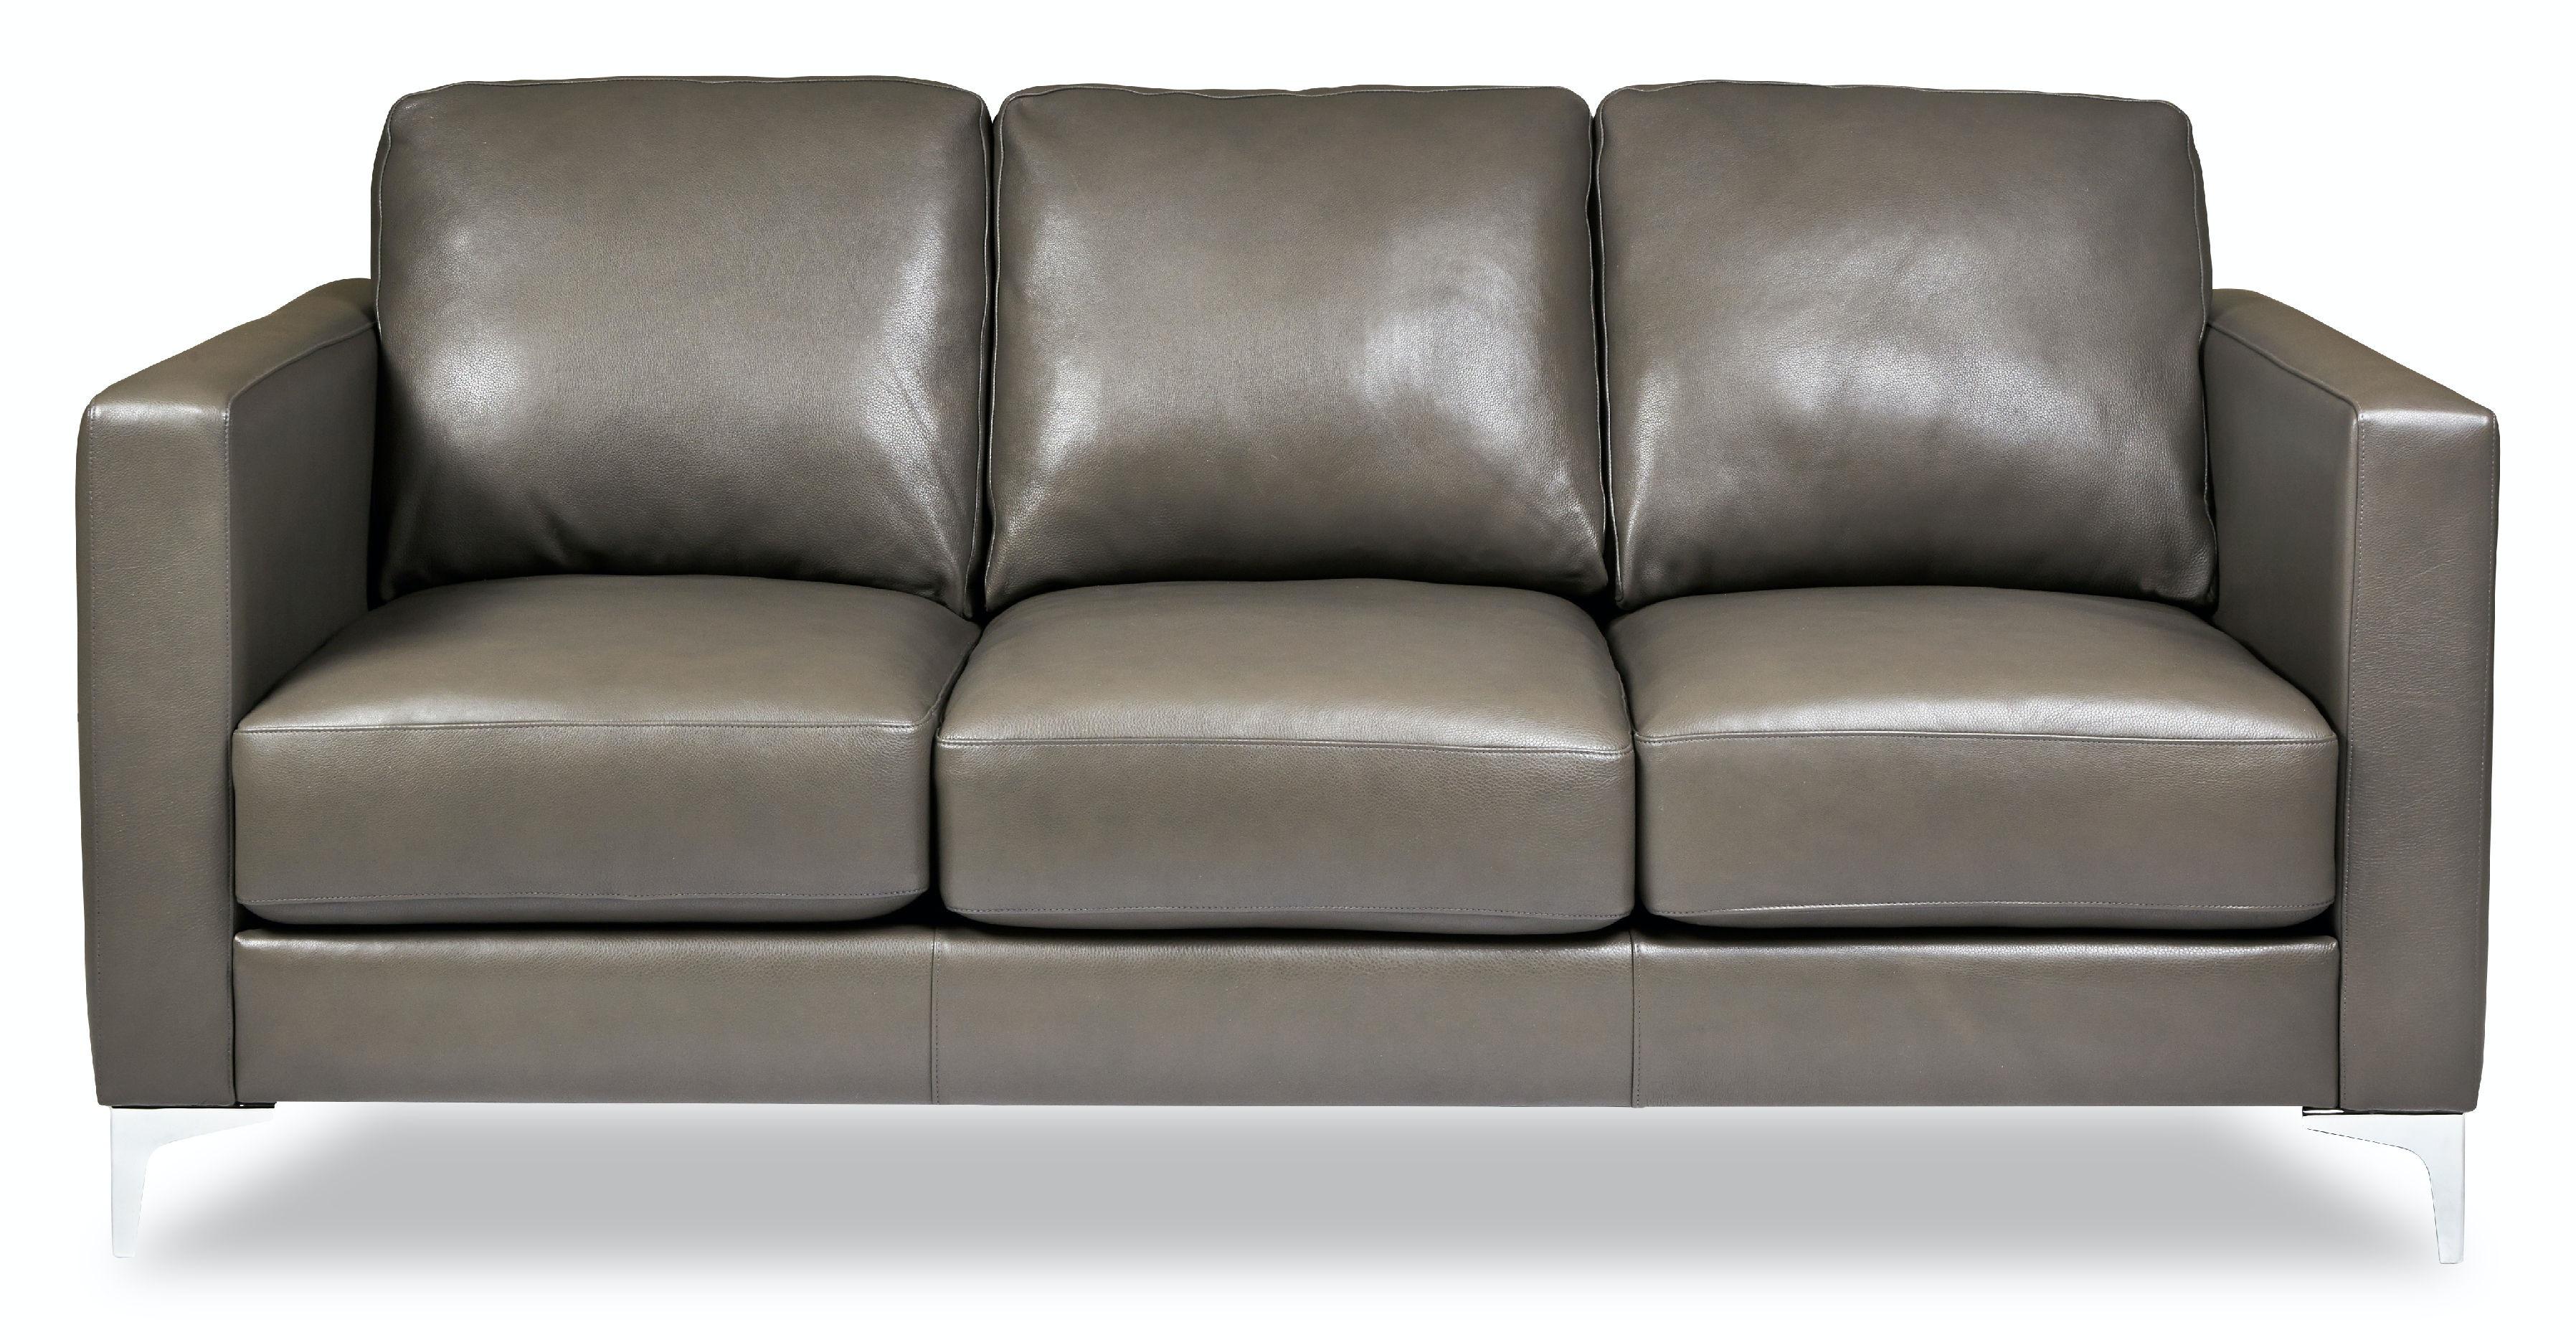 American Leather Three Cushion Sofa KND SO3 ST